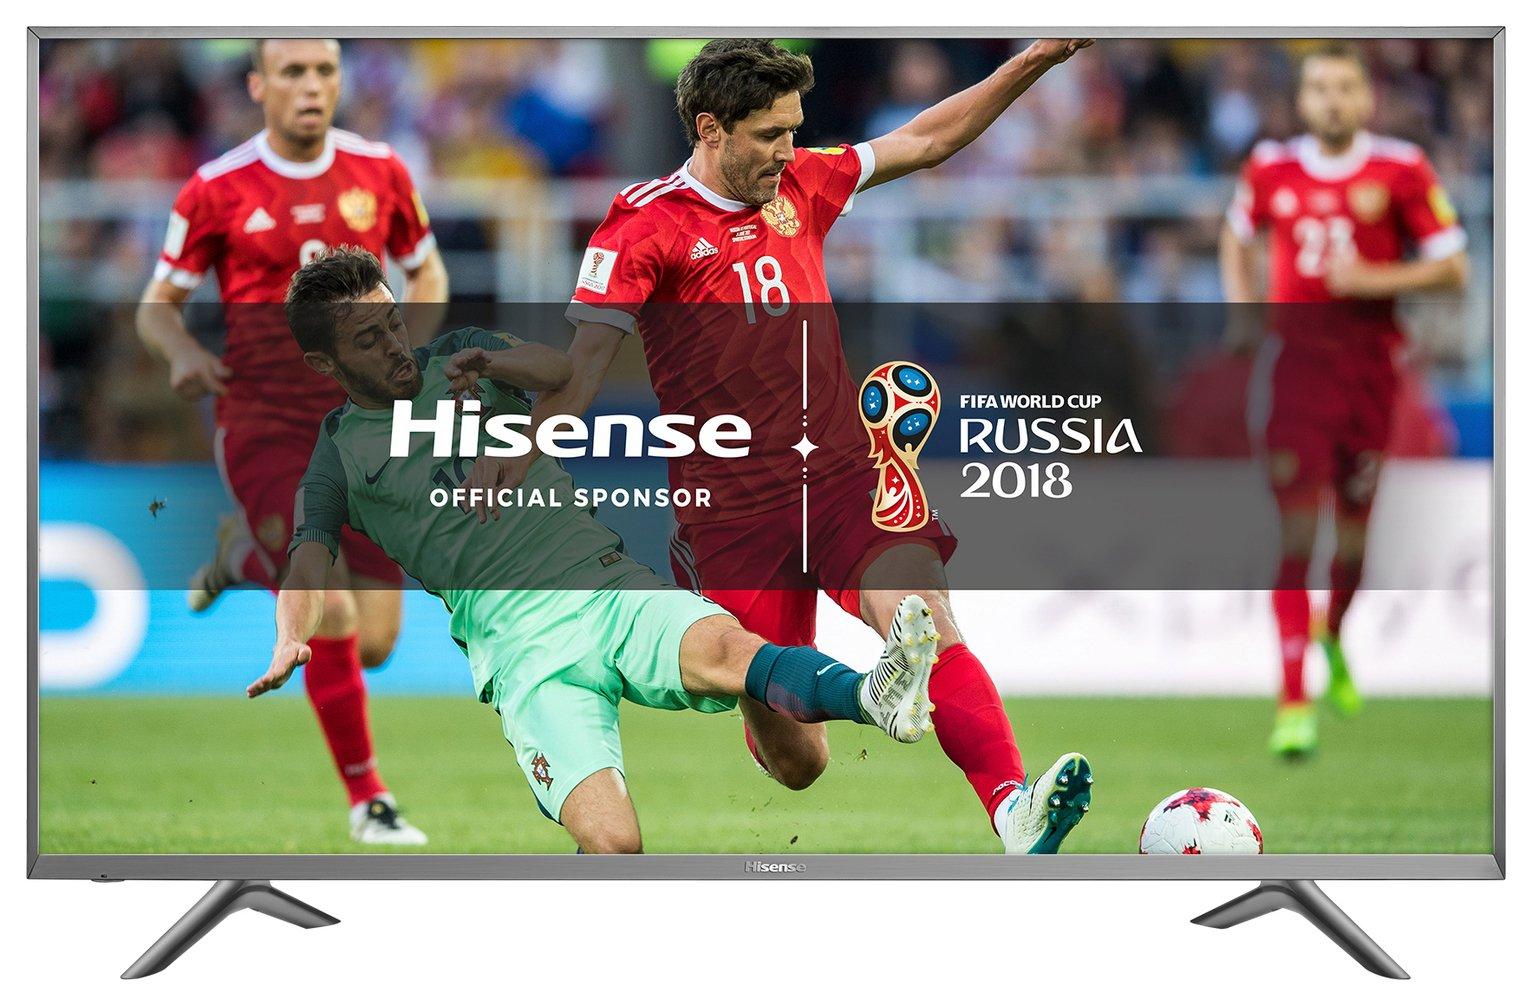 Hisense Hisense H65N5750 65 Inch 4K Ultra HD Smart TV with HDR